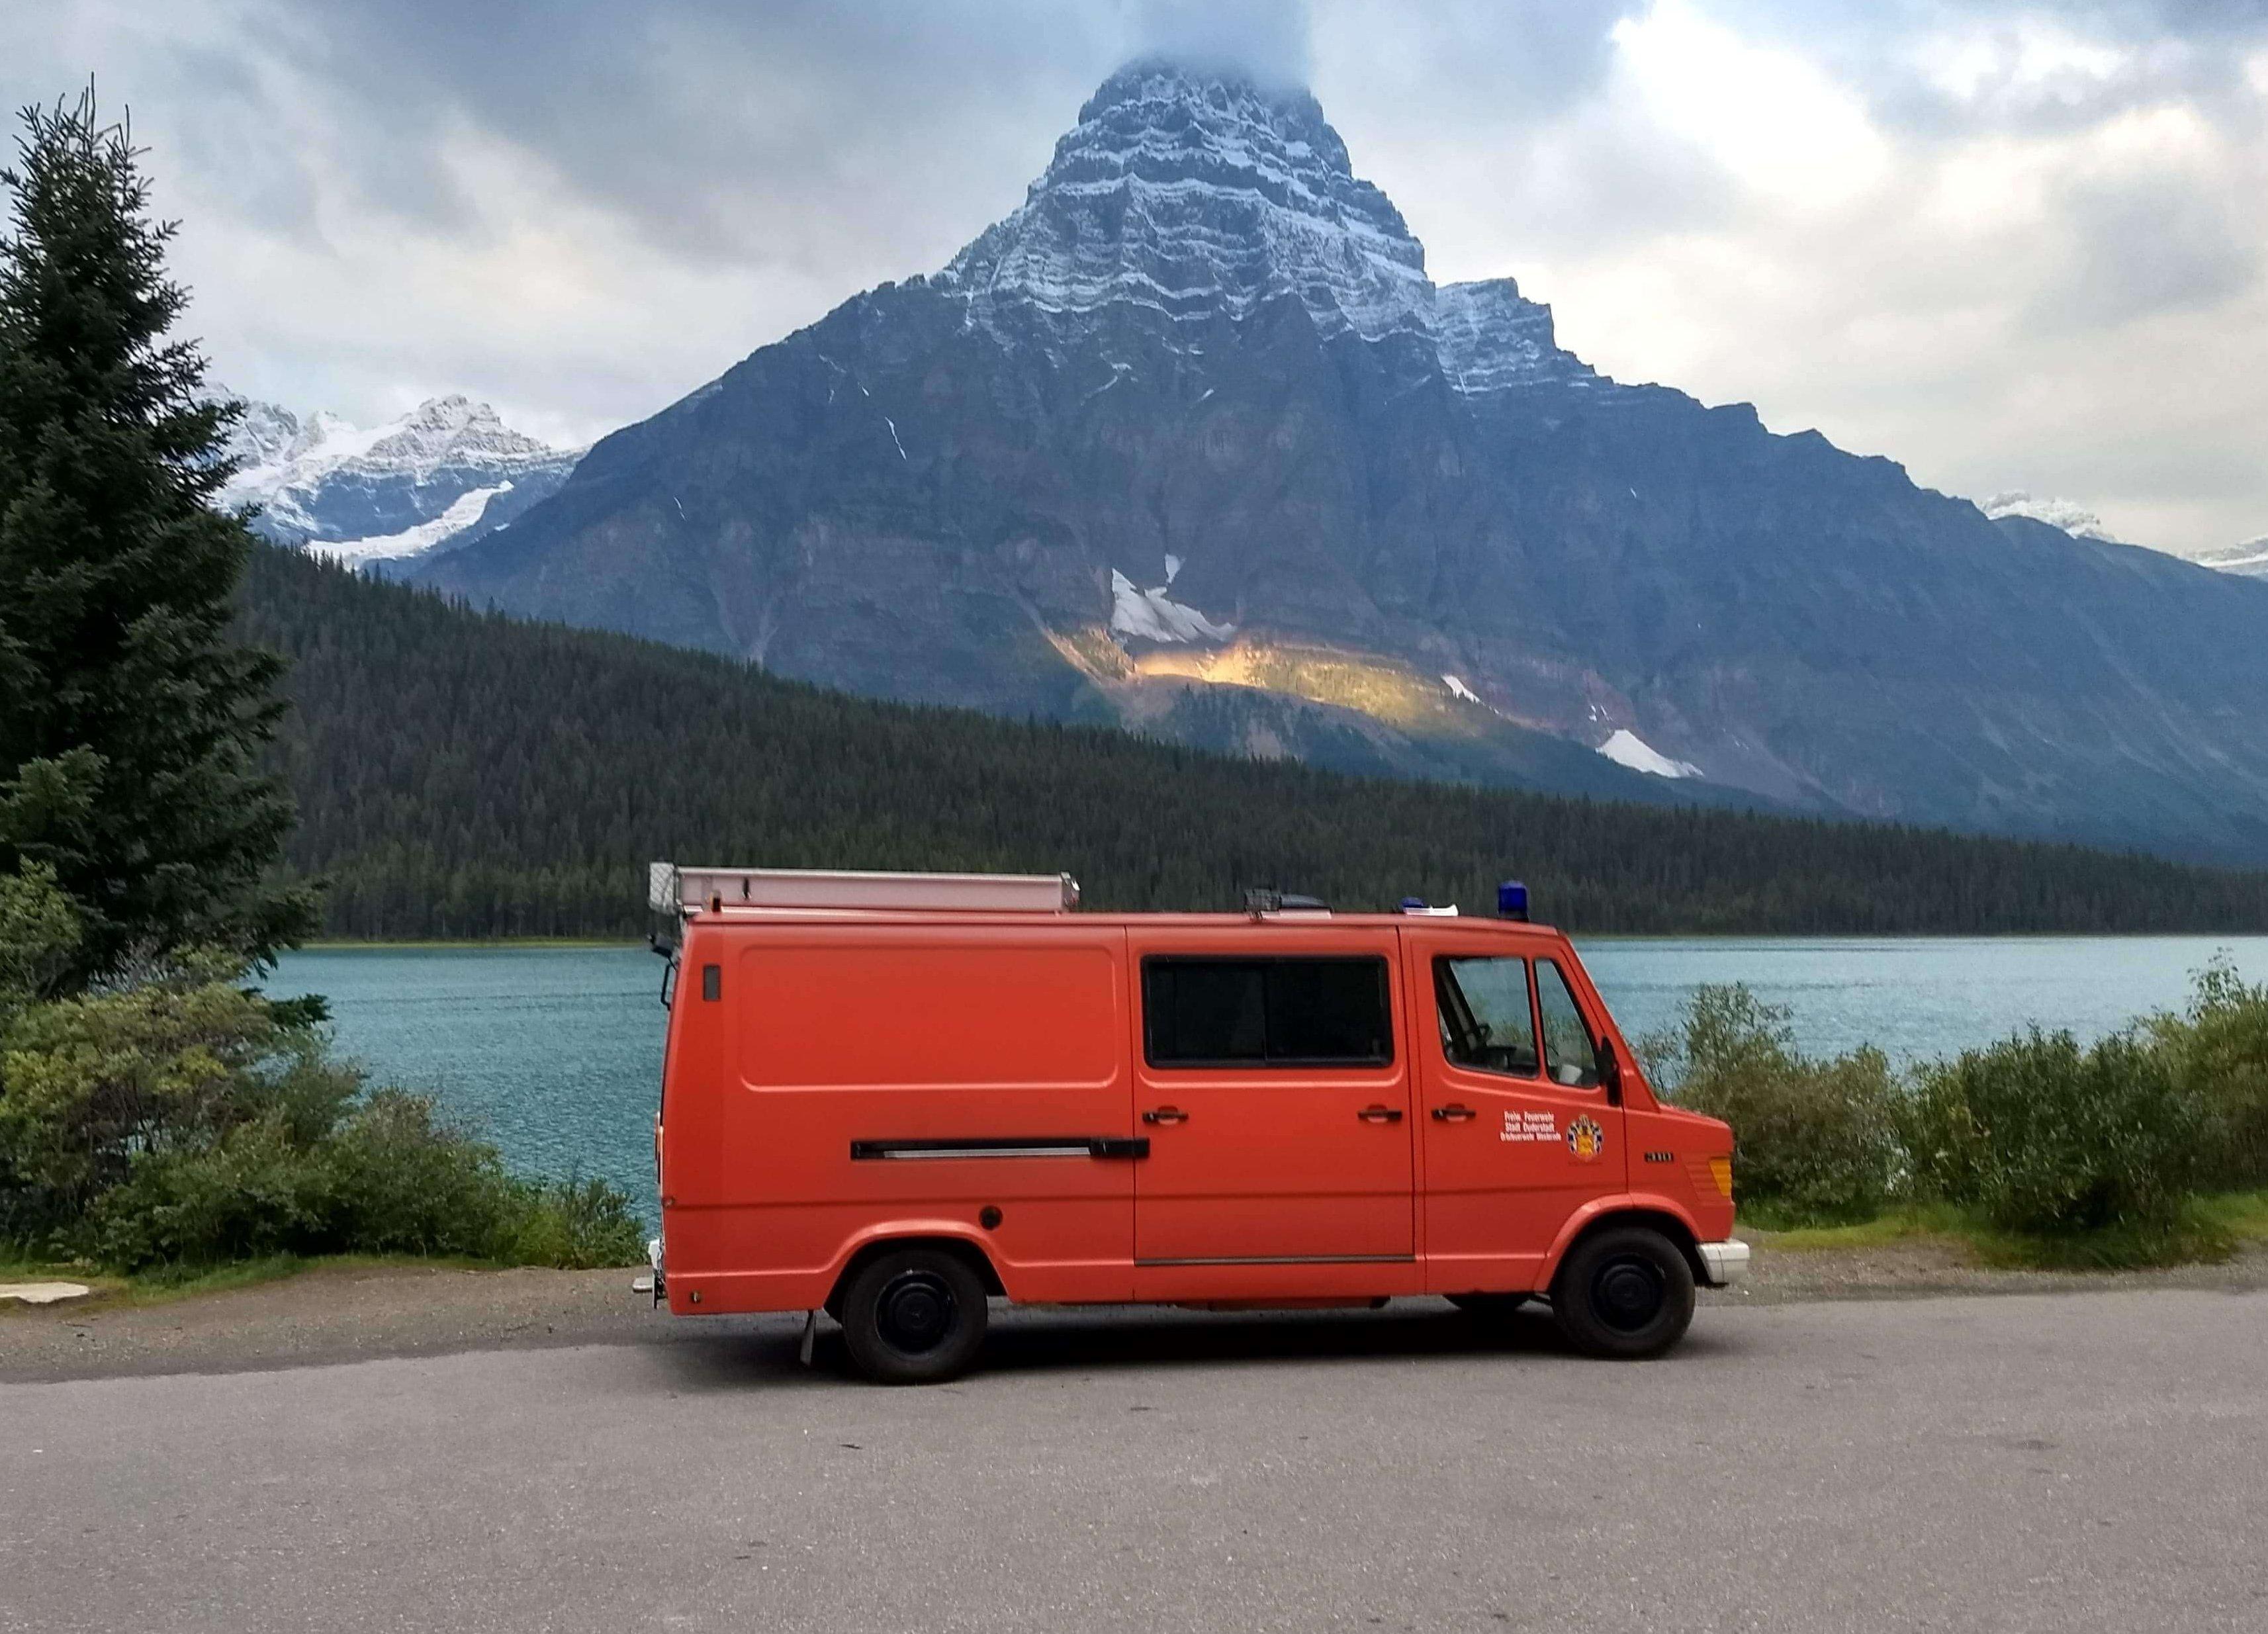 german ambulance van life the best van to buy online camper conversion to live in van build